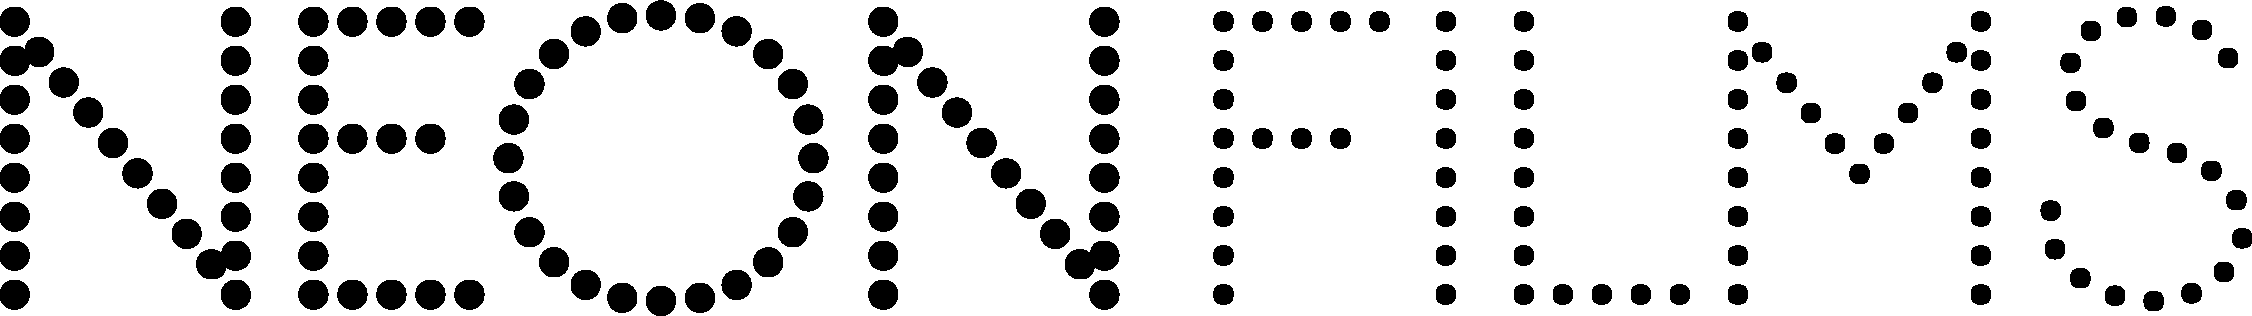 Neonfilms Logo